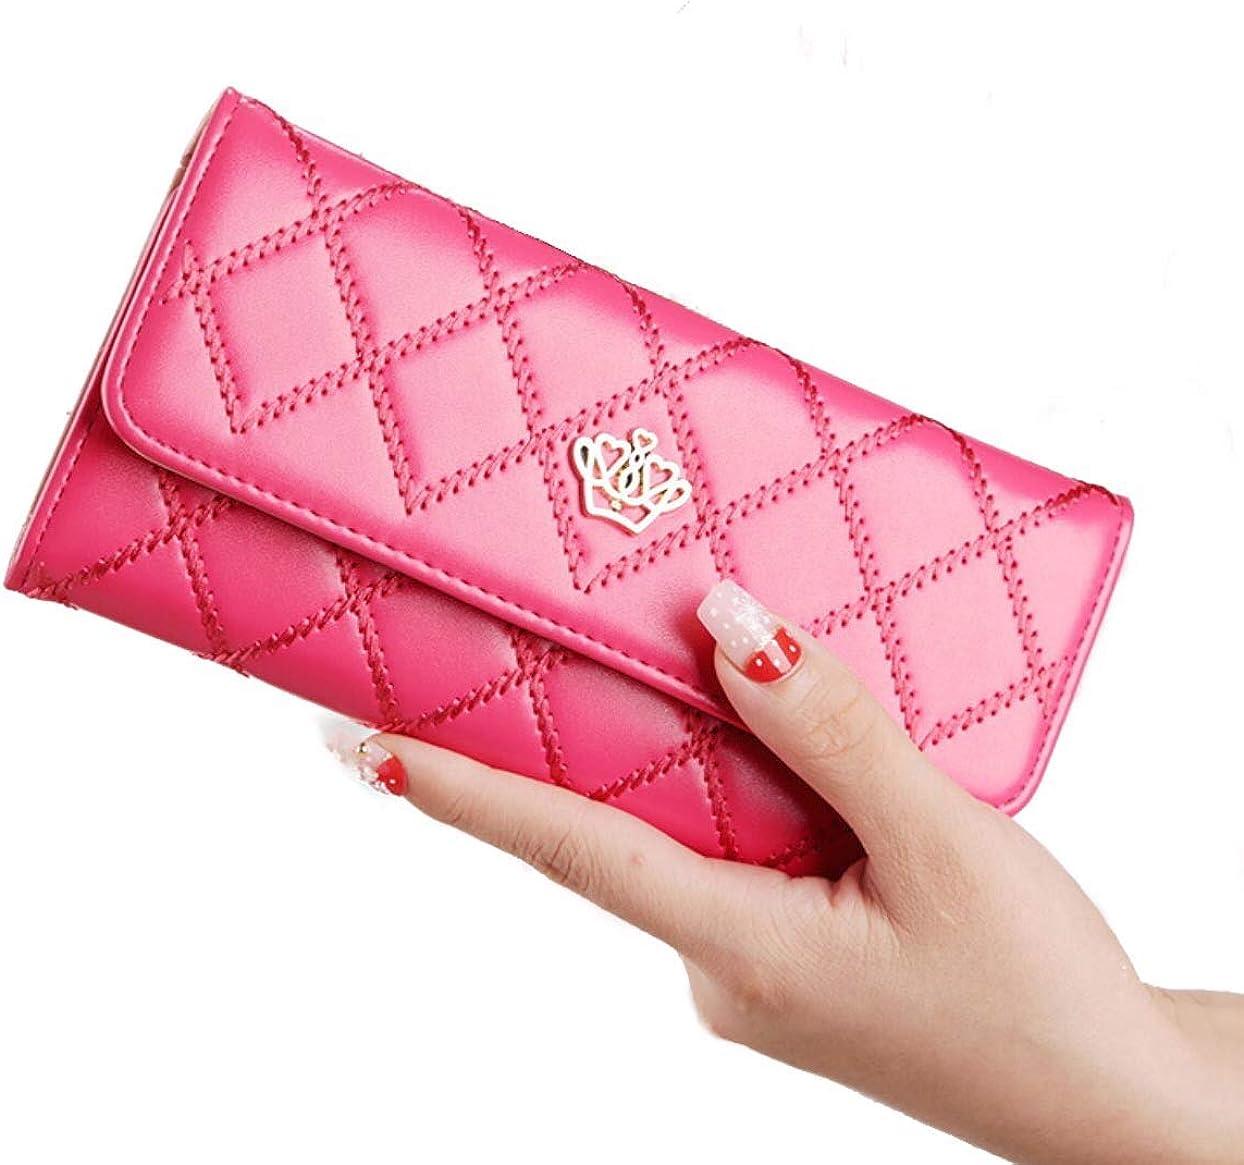 Fashion Women Credit ID Card Long Crown Leather Clutch Purse Handbag Wallet